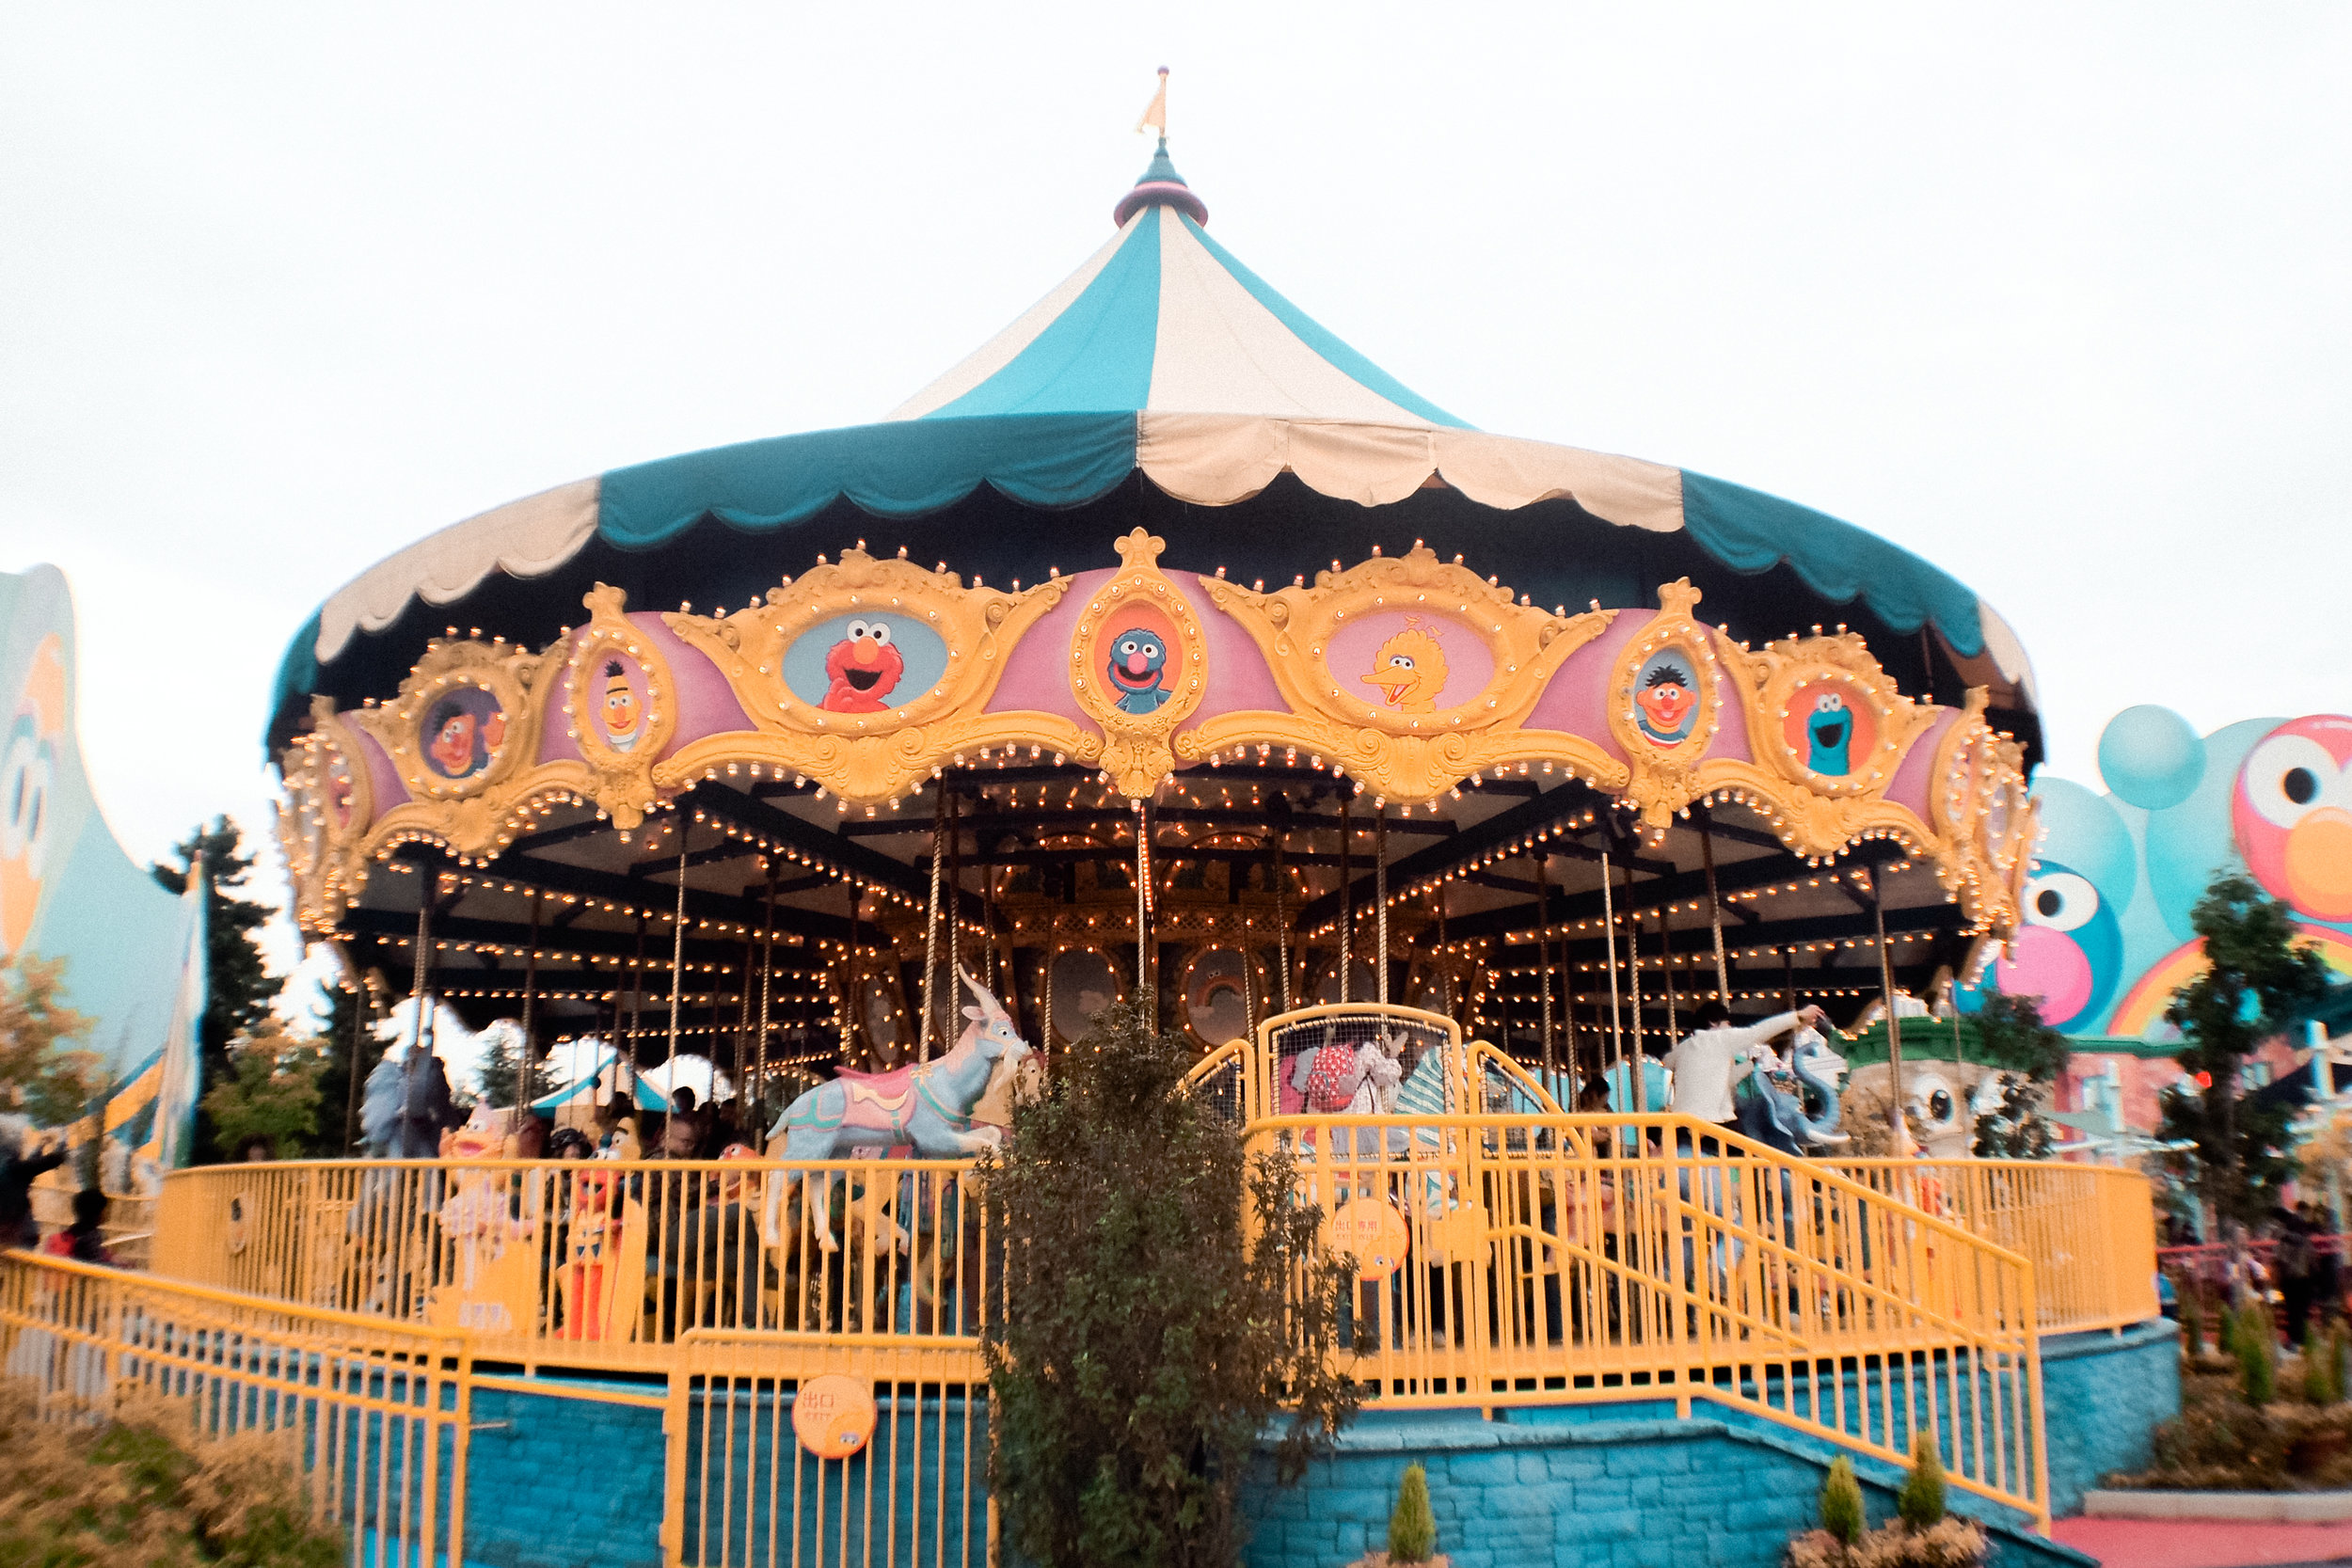 Sesame Street merry-go-round!